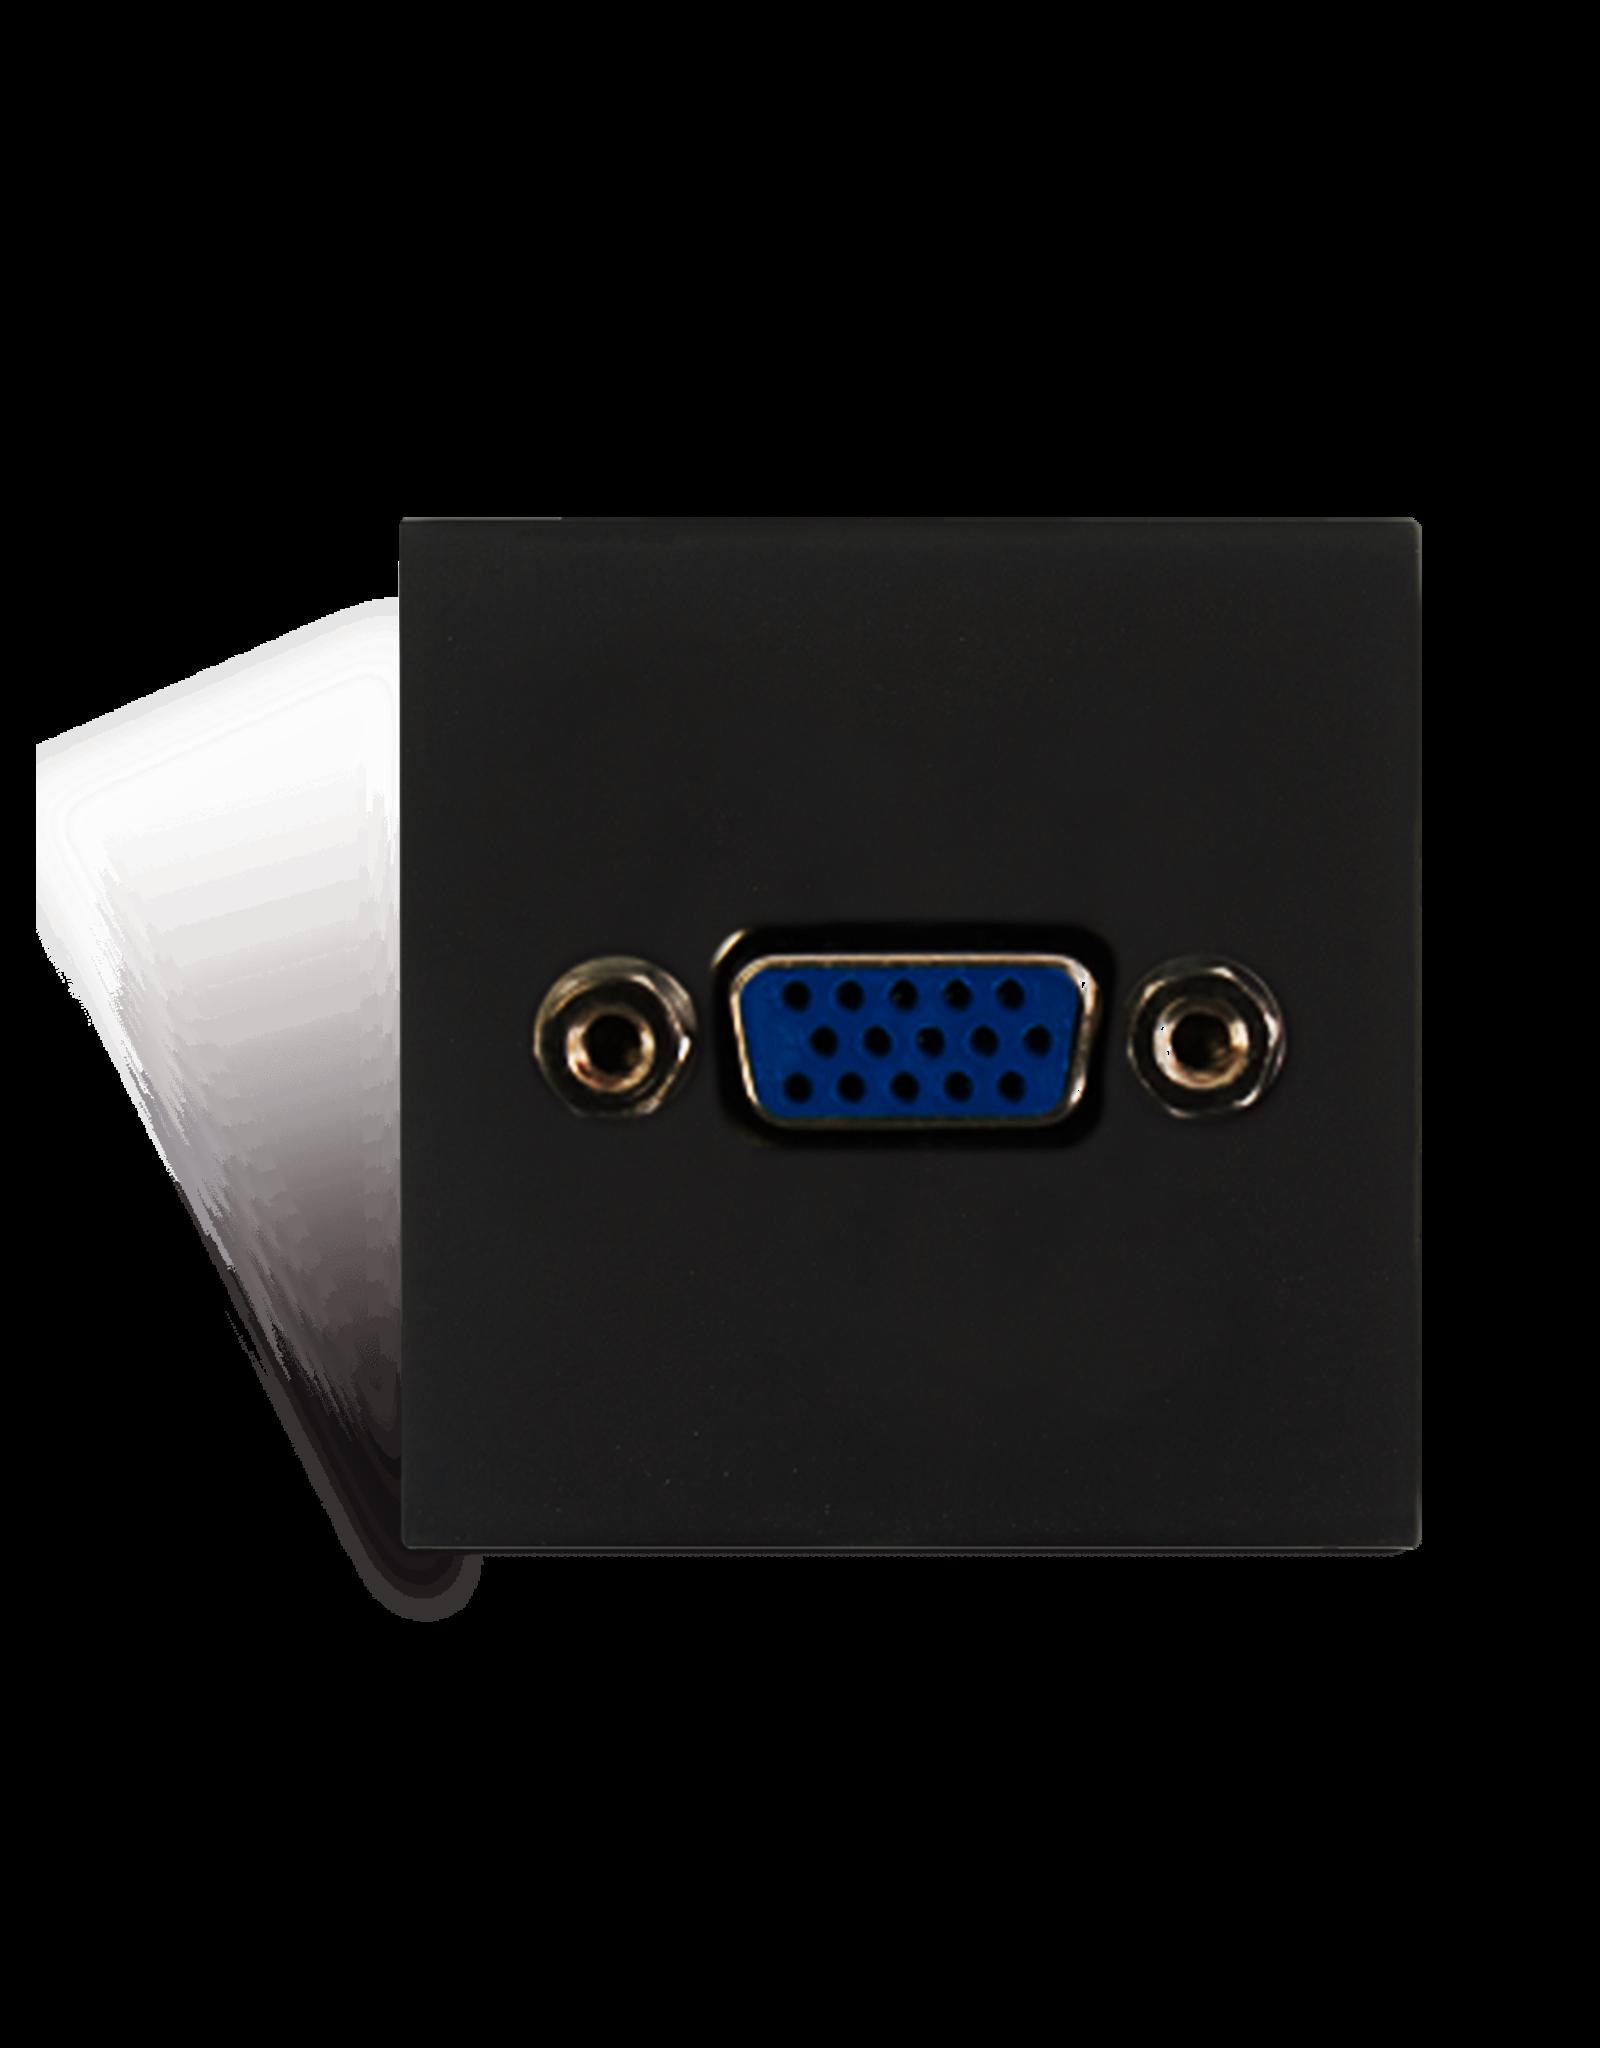 Audac Connection plate VGA 45 x 45 mm Black version